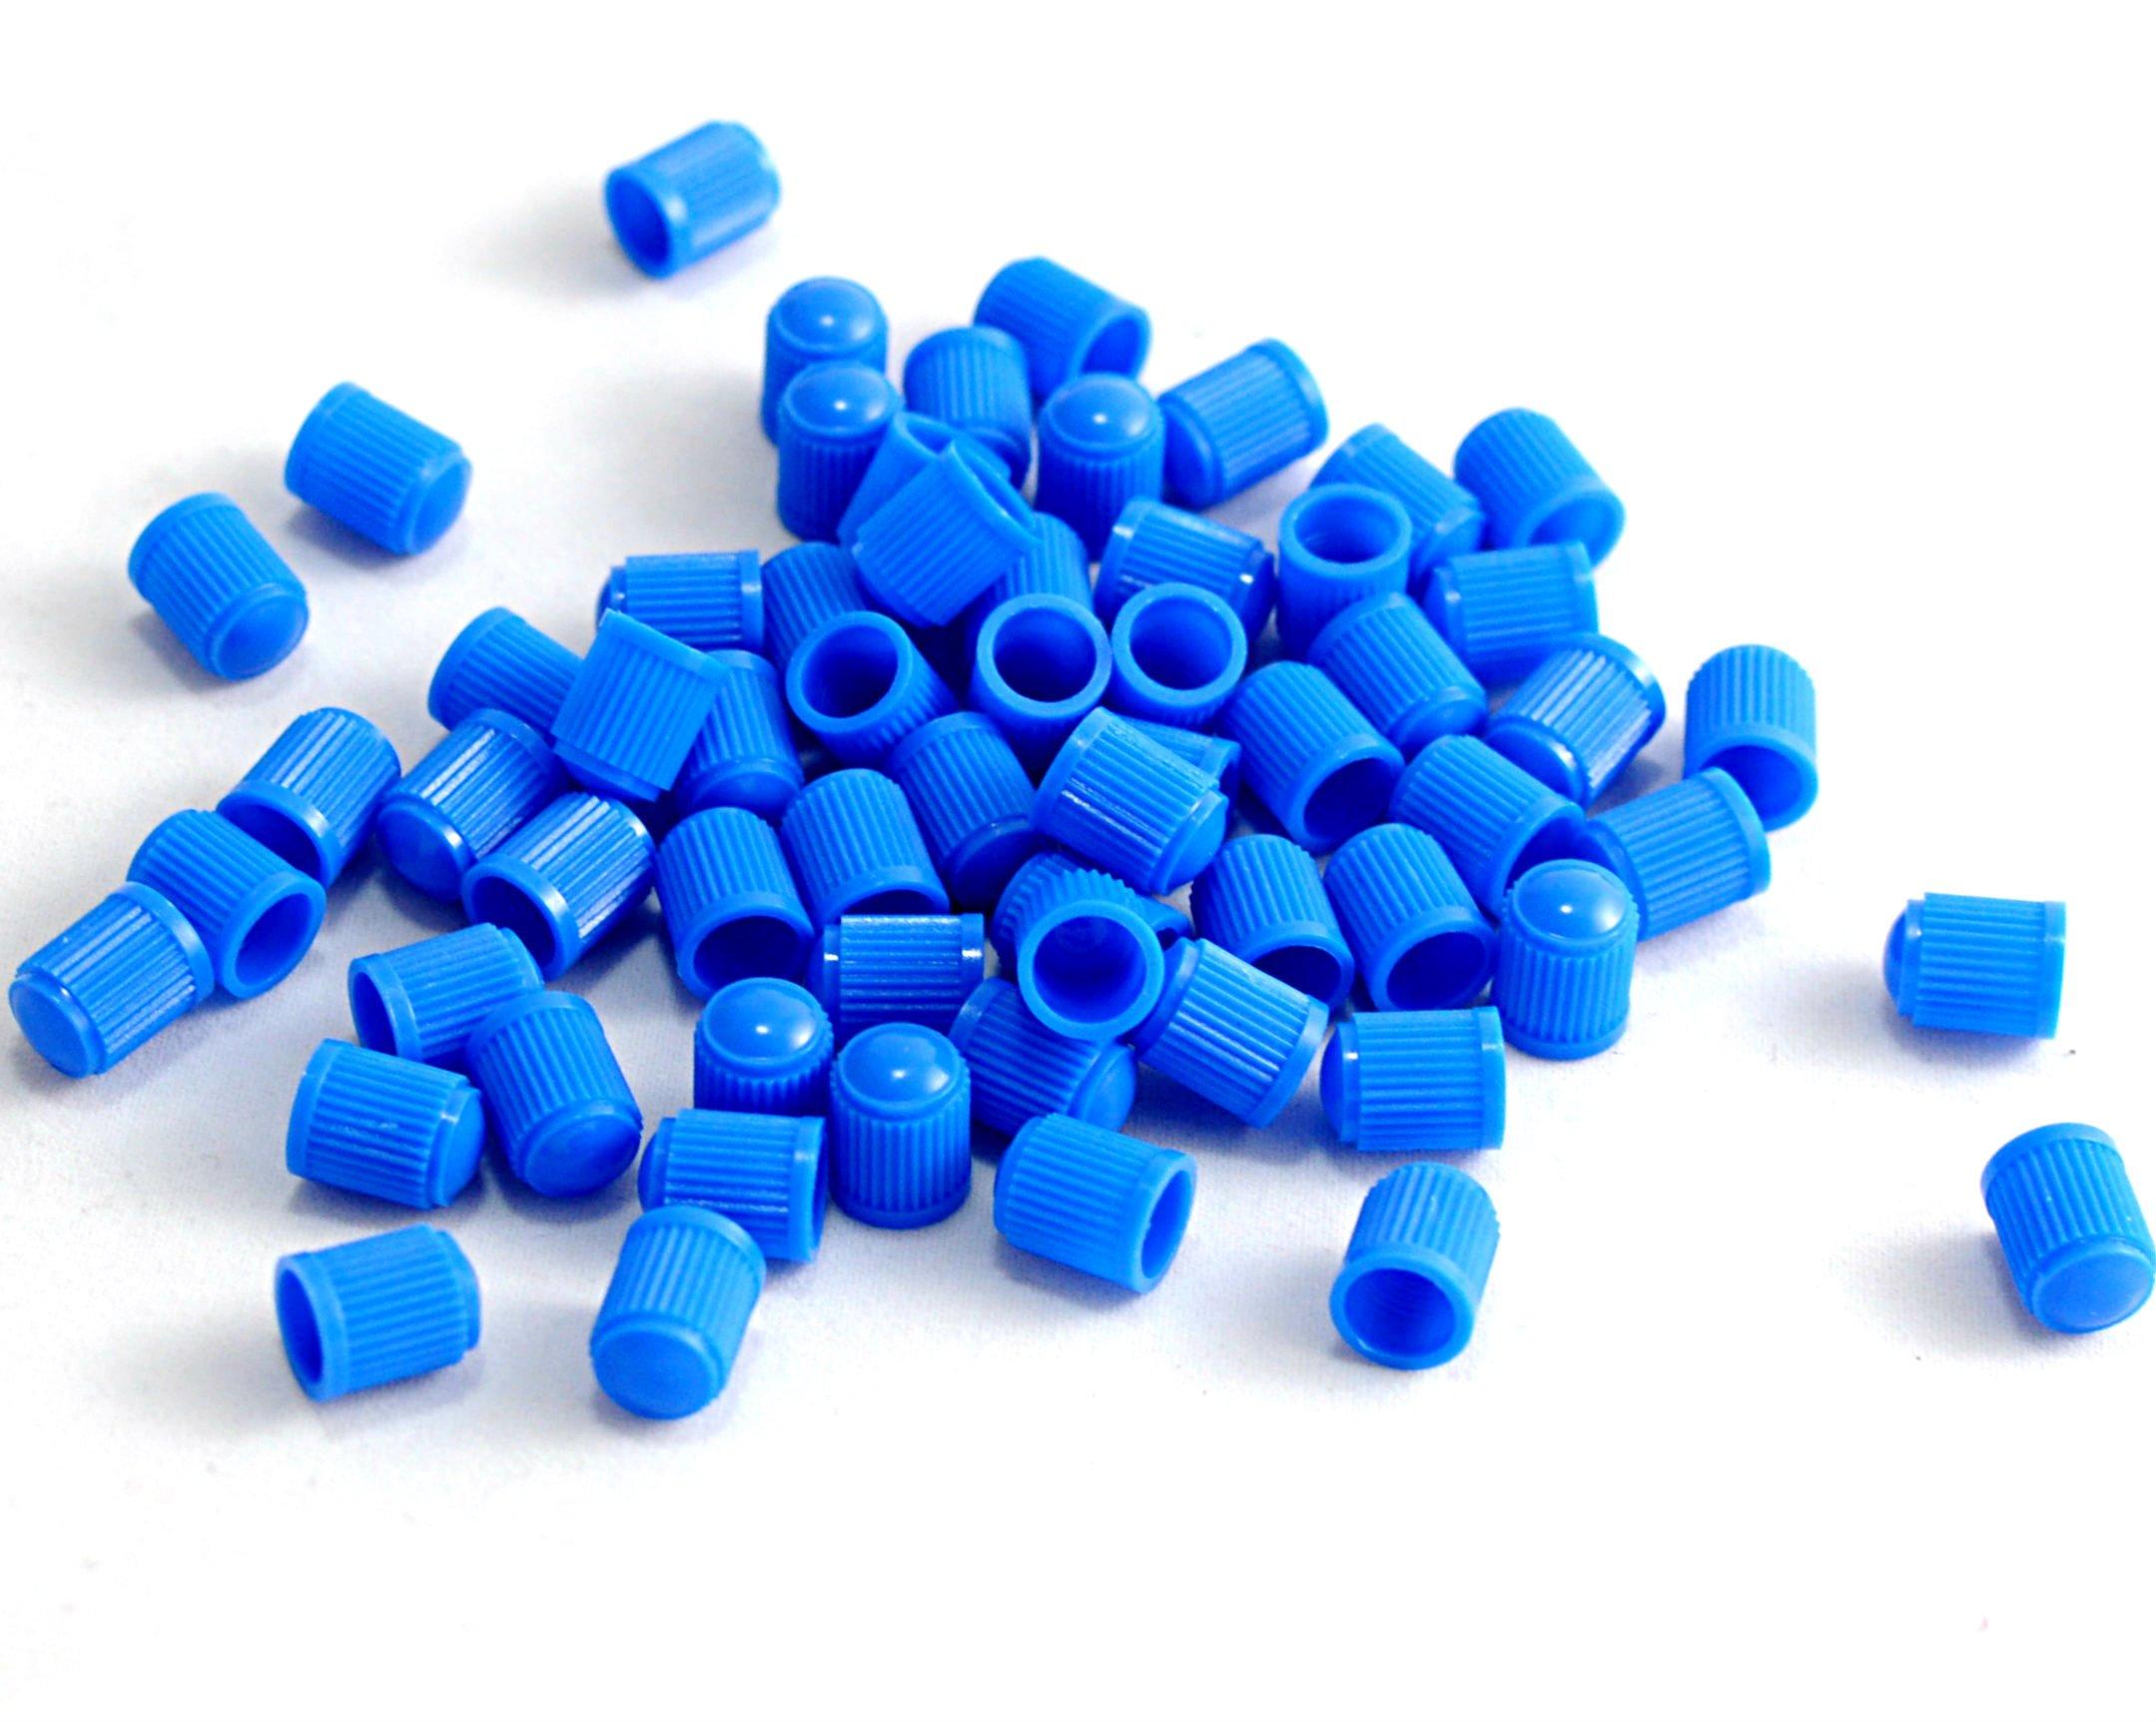 20 tappi antipolvere per viti per pneumatici, in plastica, colore: blu.